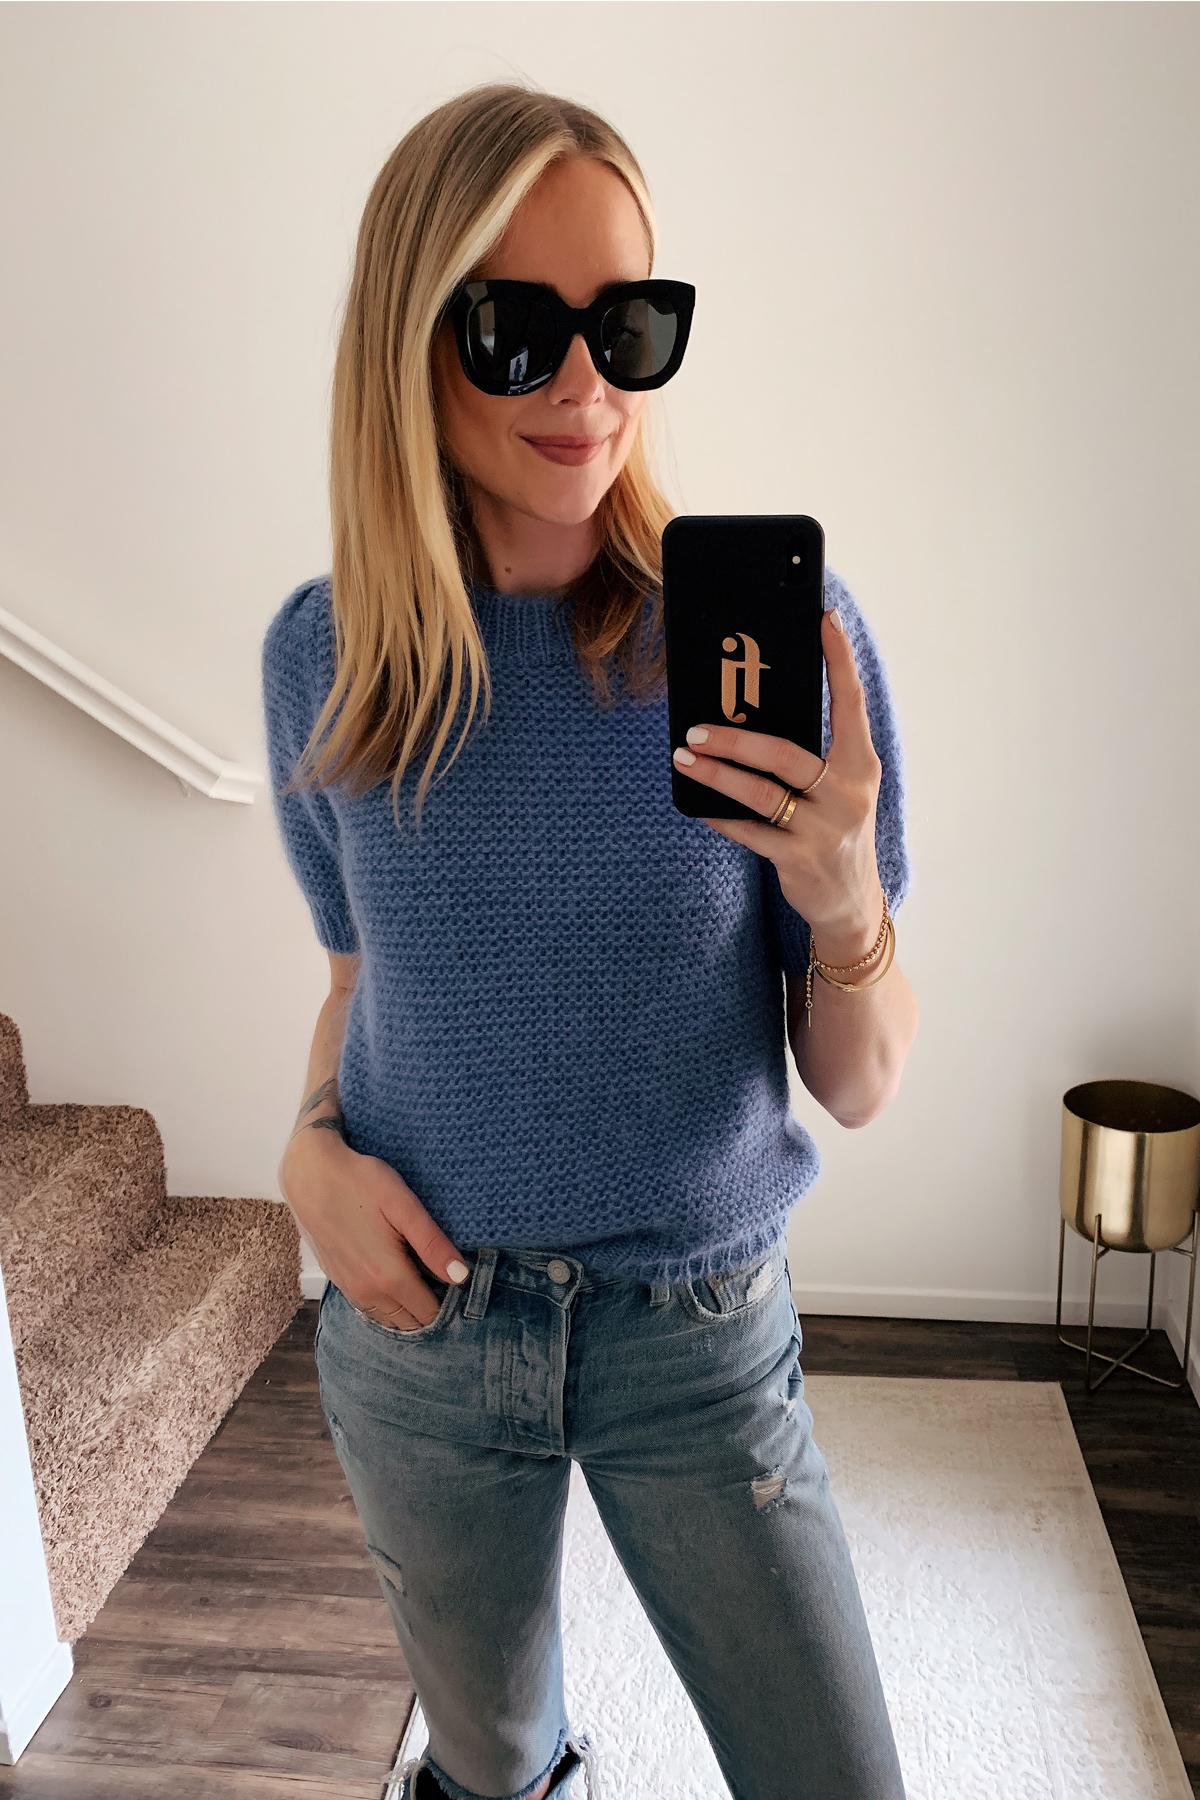 Fashion Jackson Wearing Celine Black Cat Eye Sunglasses Anine Bing Blue Sweater Ripped Jeans